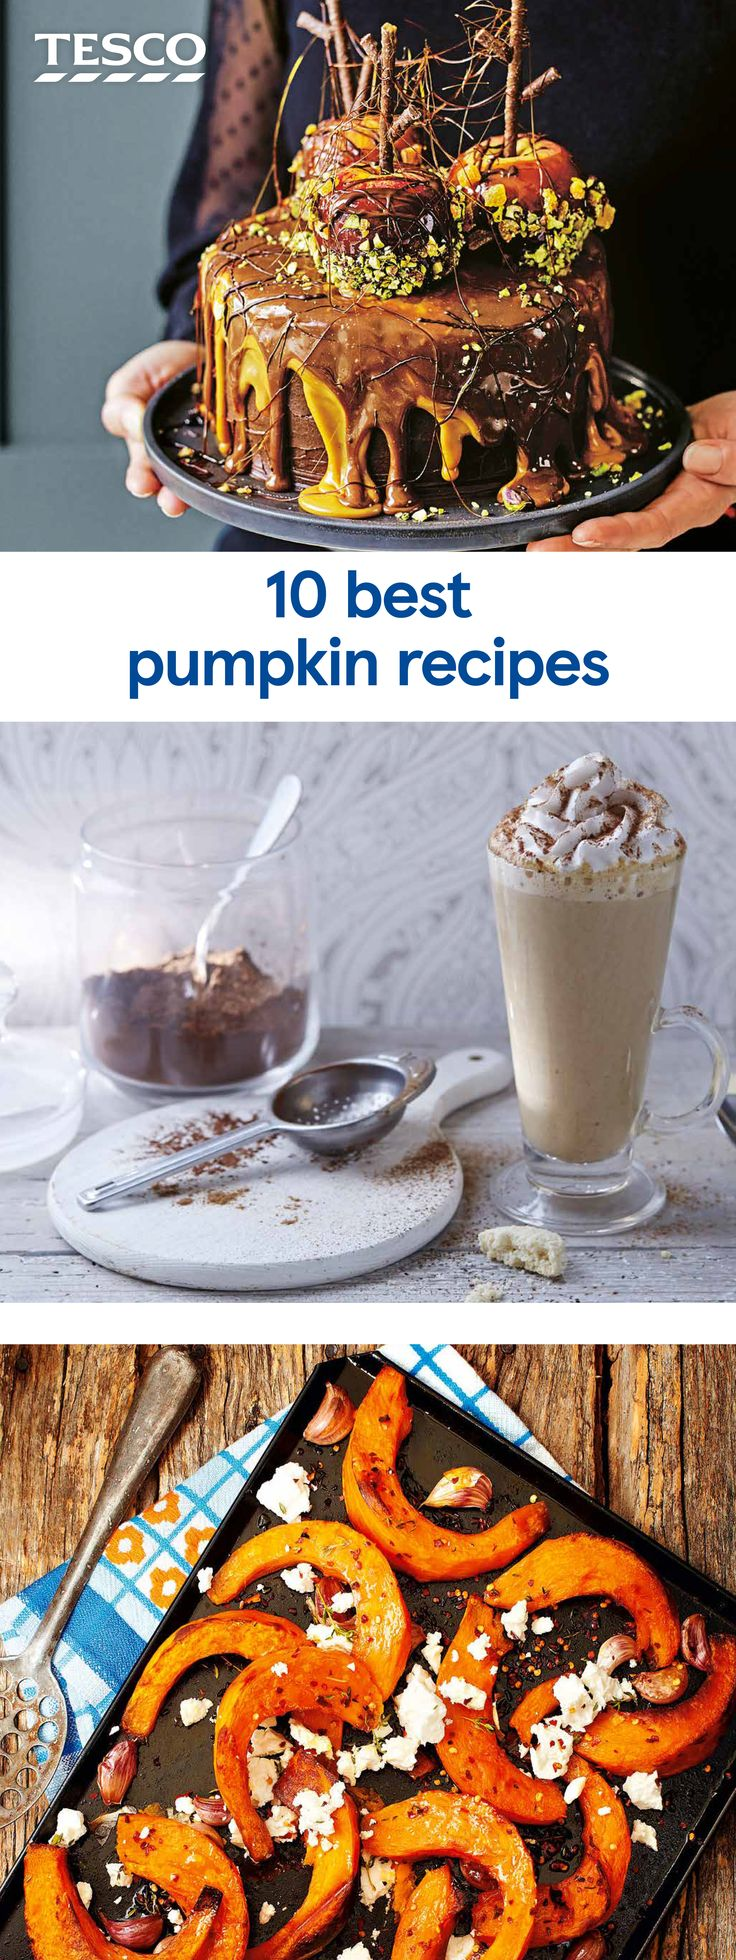 79 best halloween | tesco images on pinterest | halloween recipe